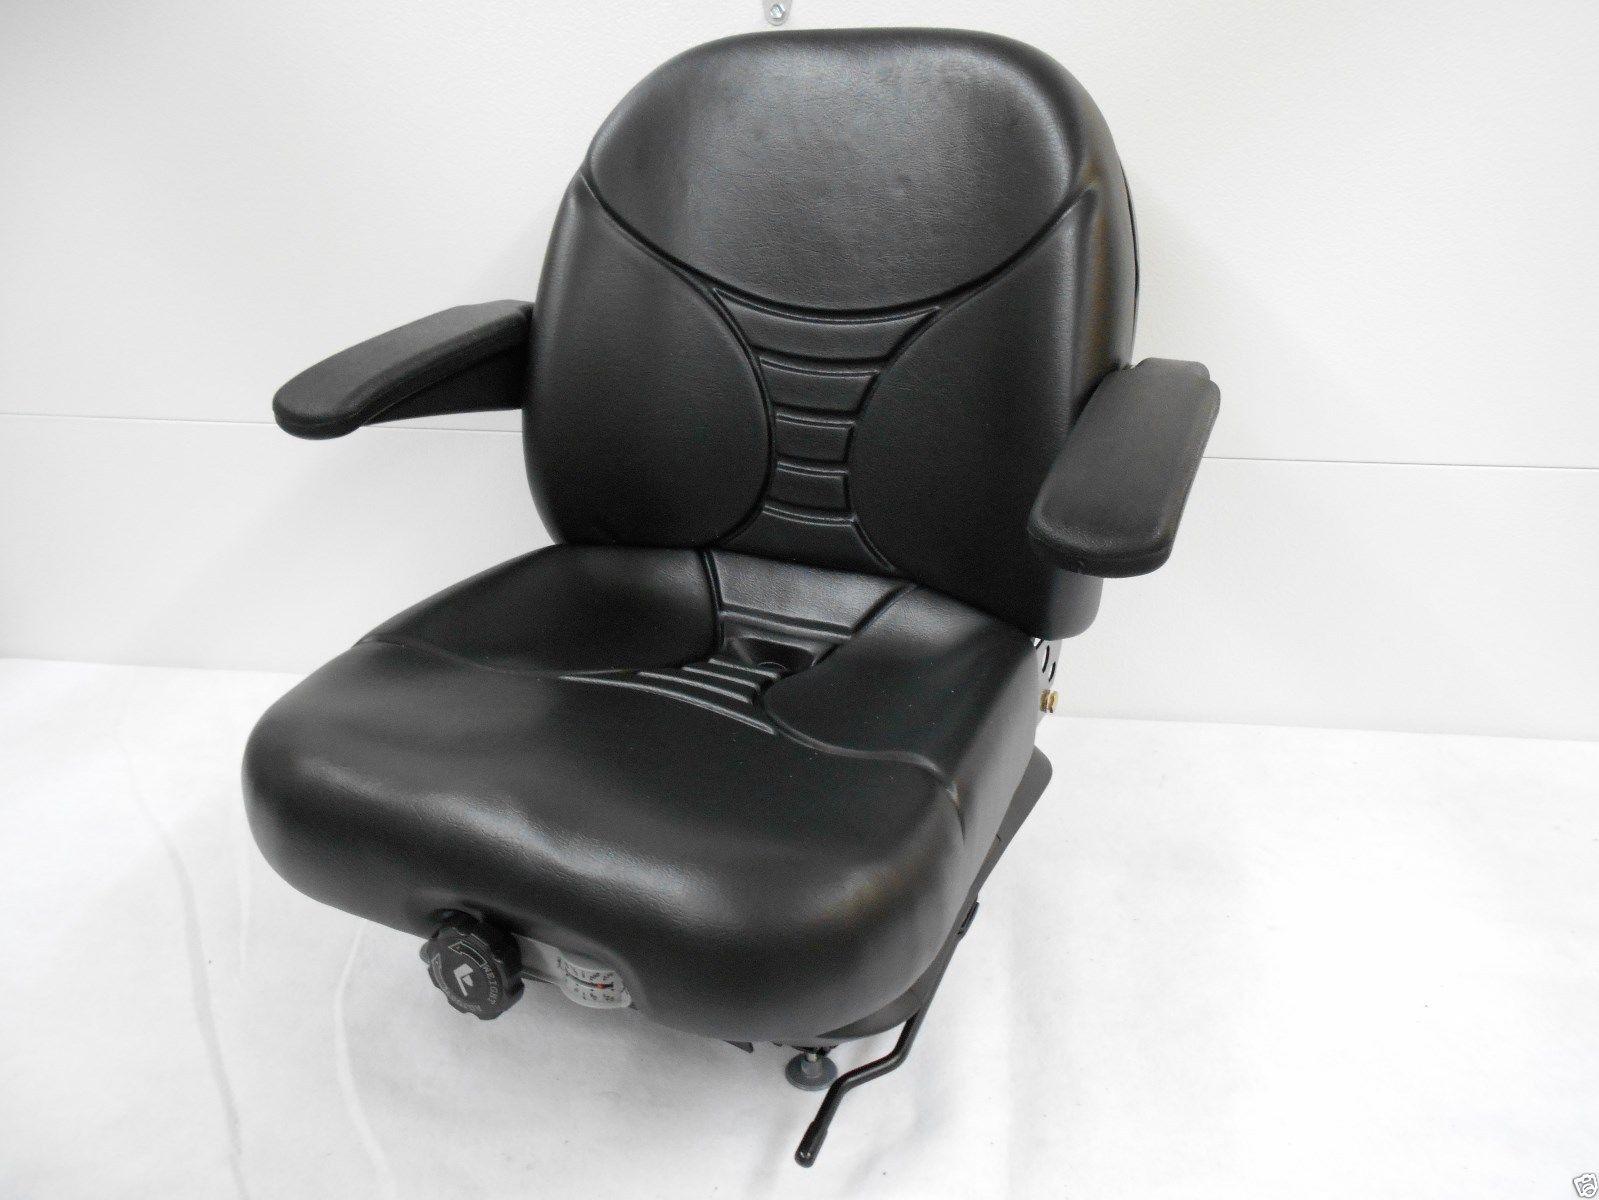 Michigan Black Seat Milsco V5300 High Back Suspension Seat W//Lumbar #15980 #HE